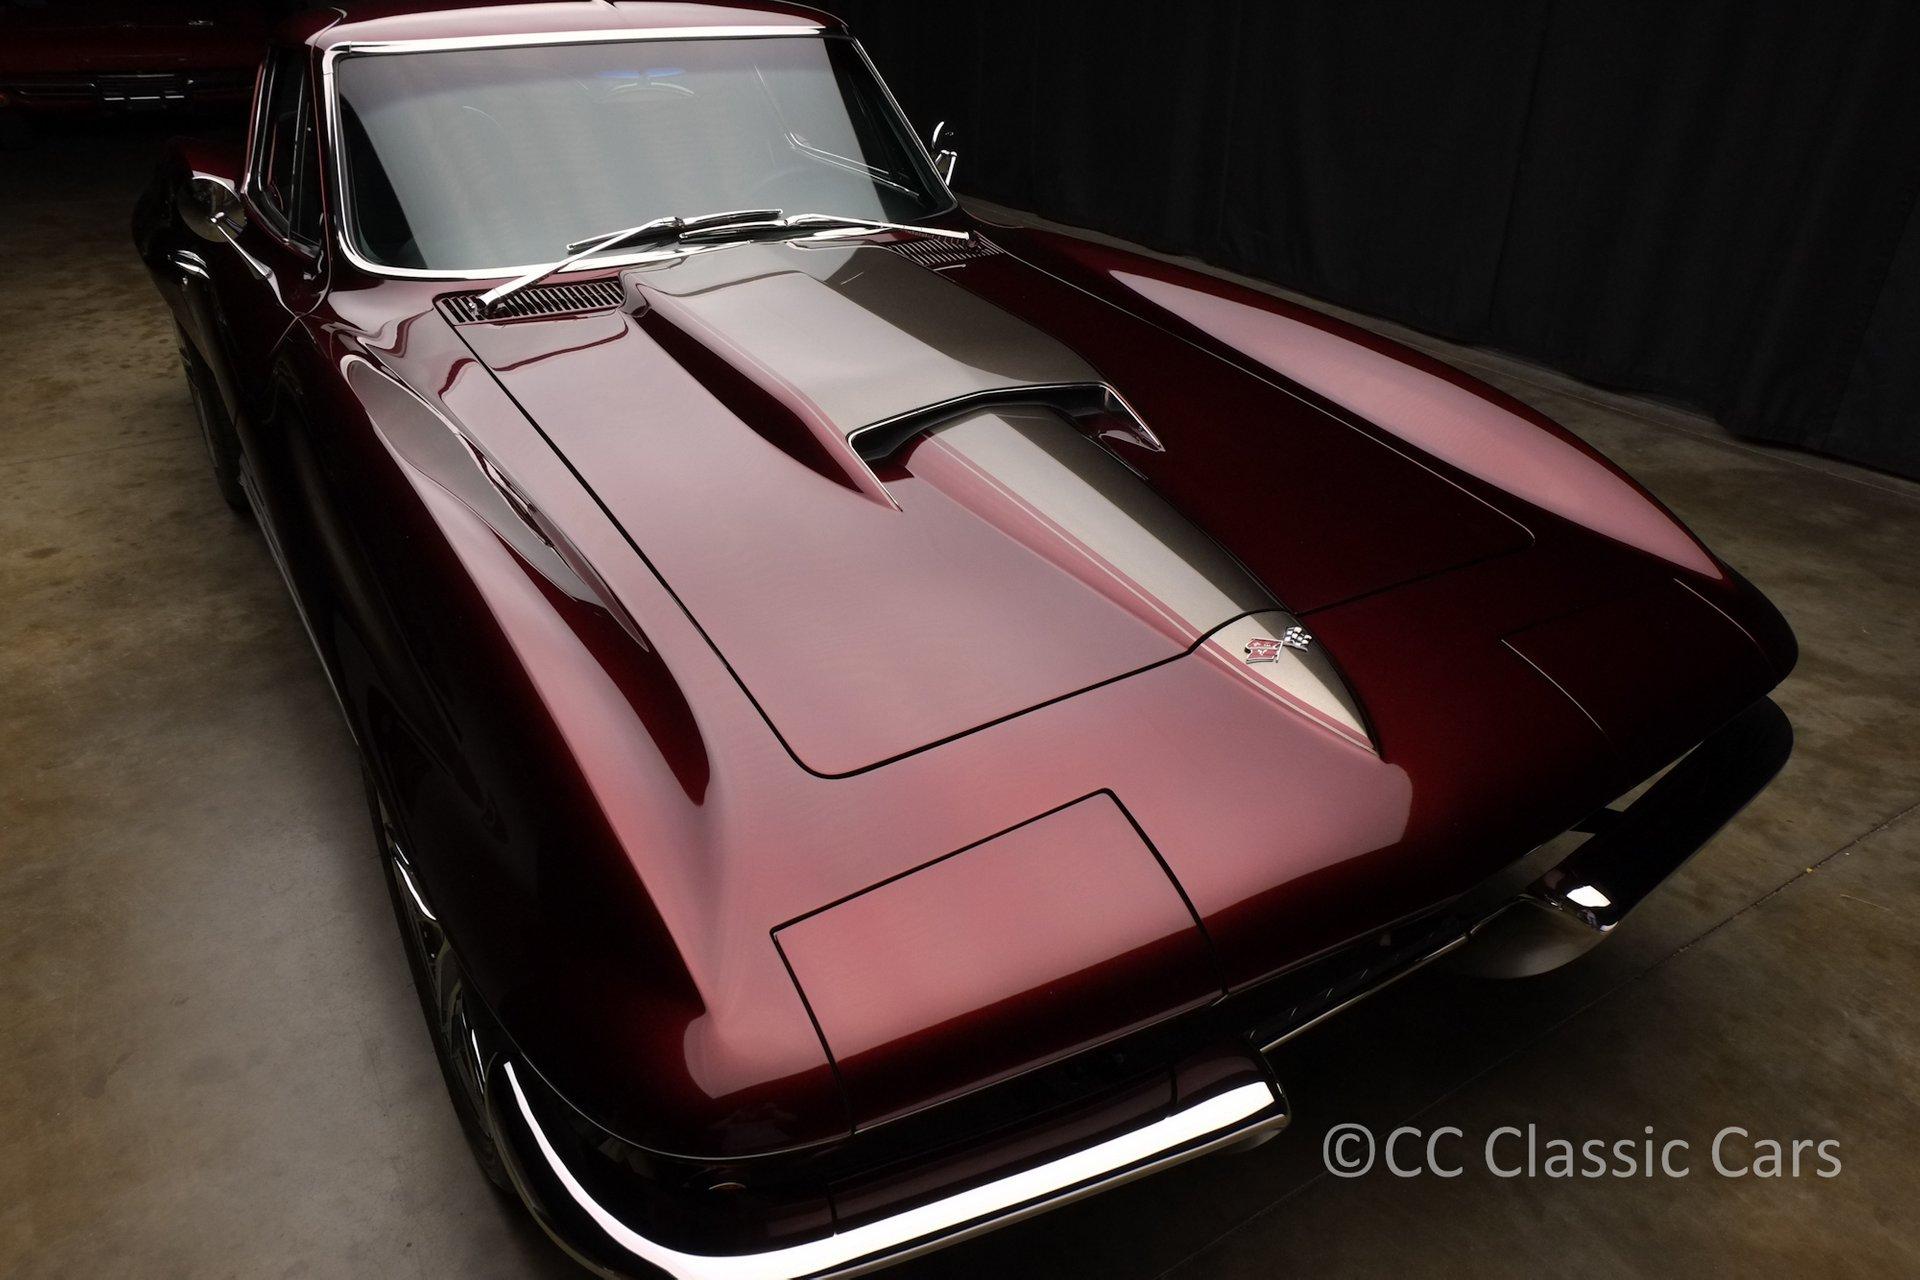 1965 Chevrolet Corvette | CC Classic Cars